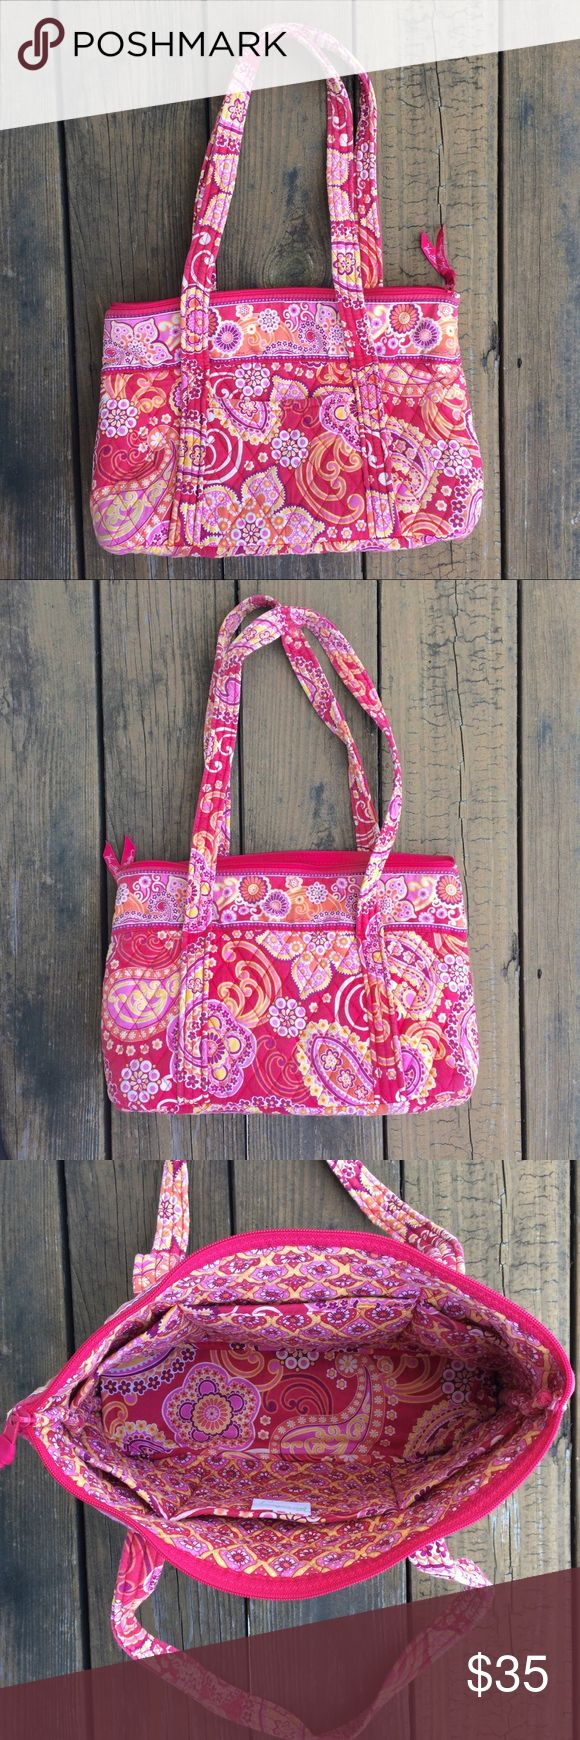 Selling this Pink/Yellow/White Vera Bradley Tote Bag on Poshmark! My username is: ksreeder. #shopmycloset #poshmark #fashion #shopping #style #forsale #Vera Bradley #Handbags